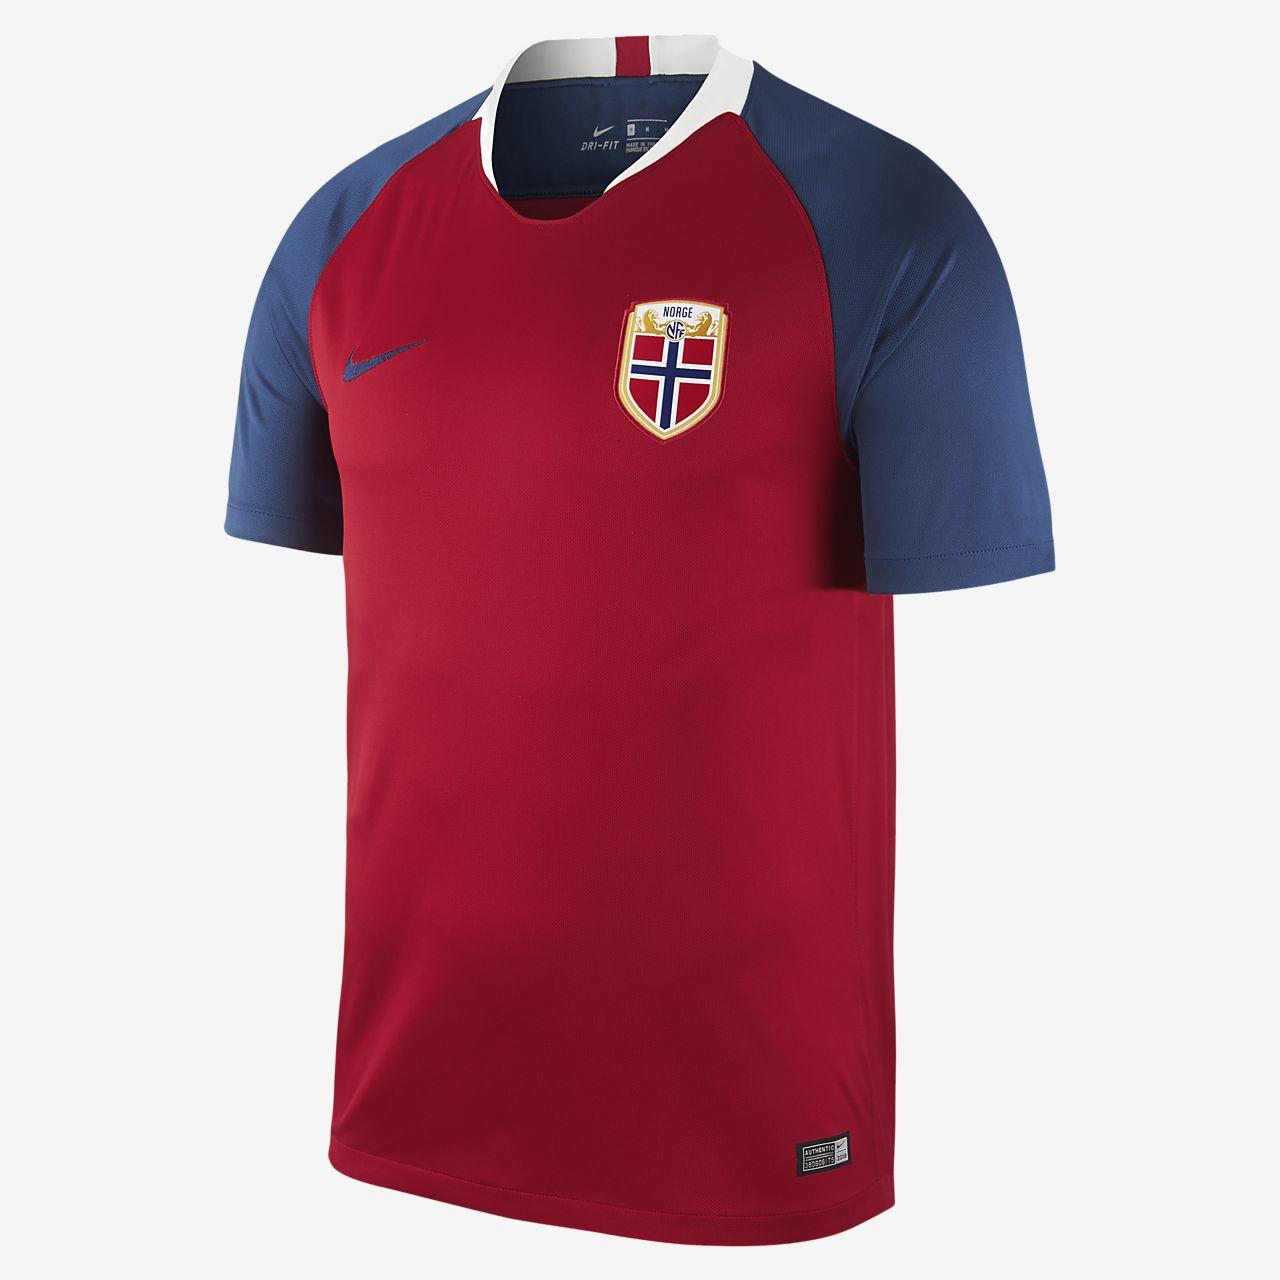 Camiseta de fútbol para hombre 2018 Norway Stadium Home